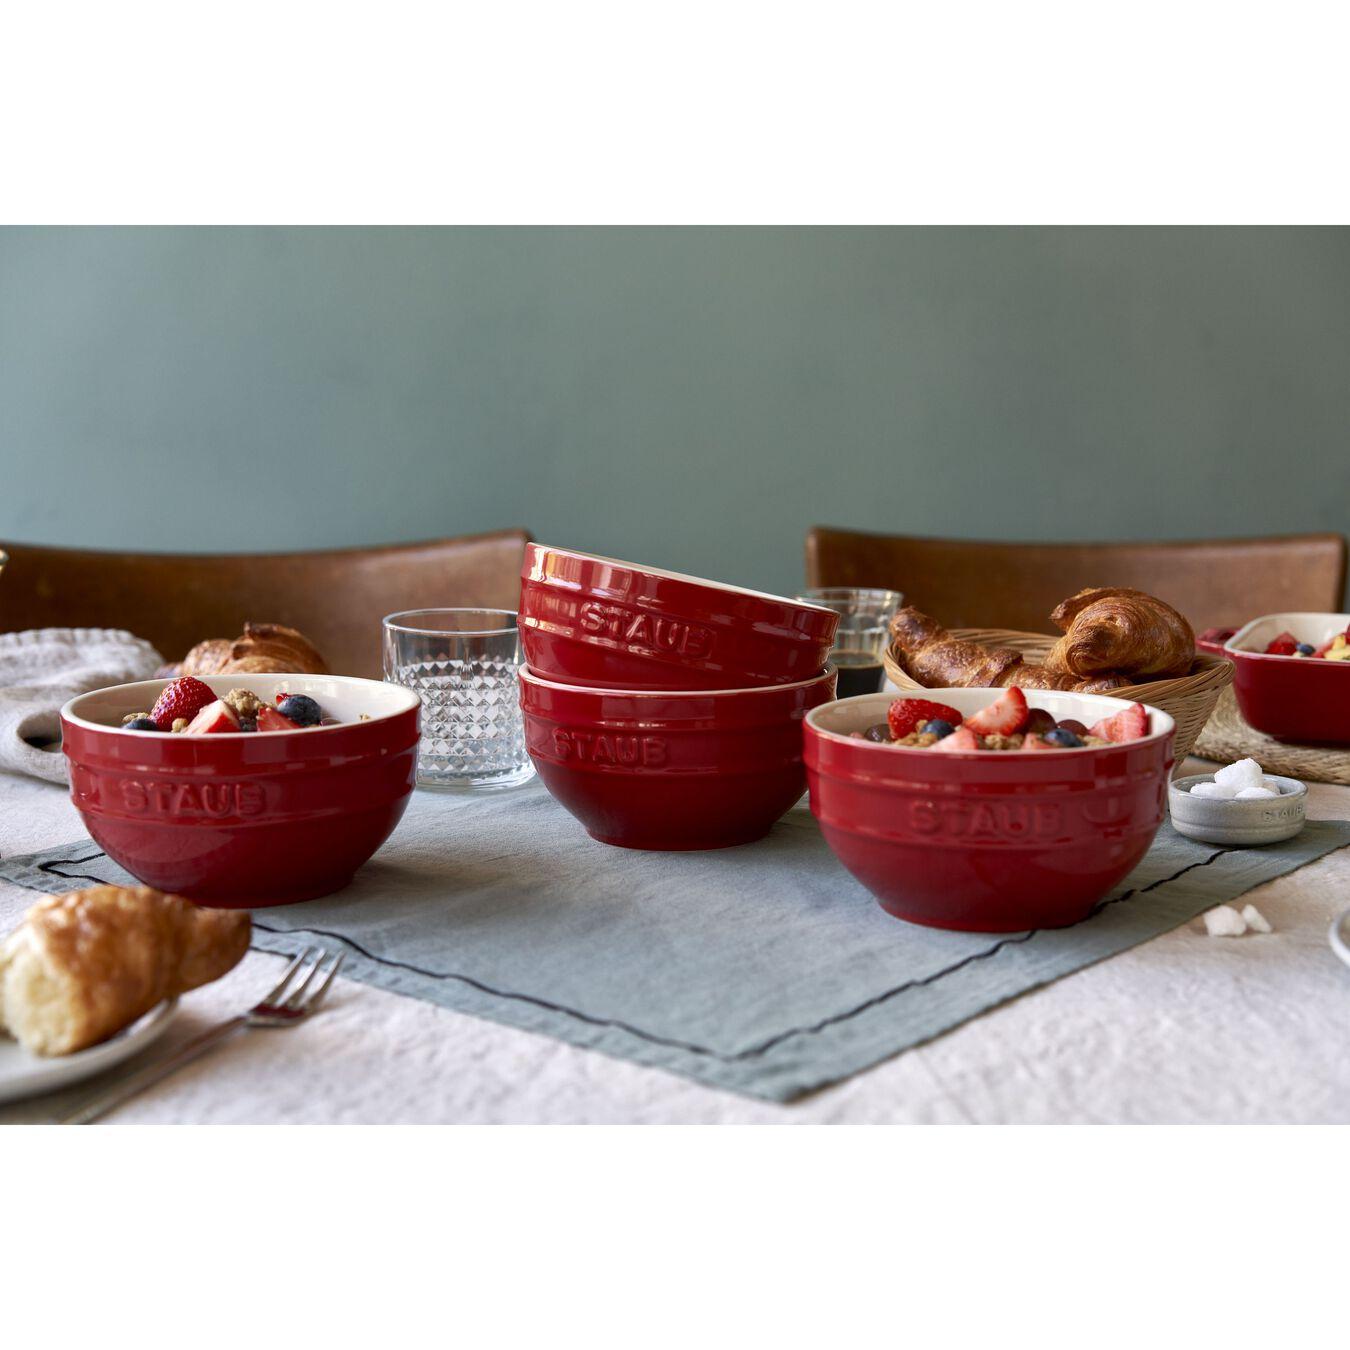 2-pc, Large Universal Bowl Set, cherry,,large 4